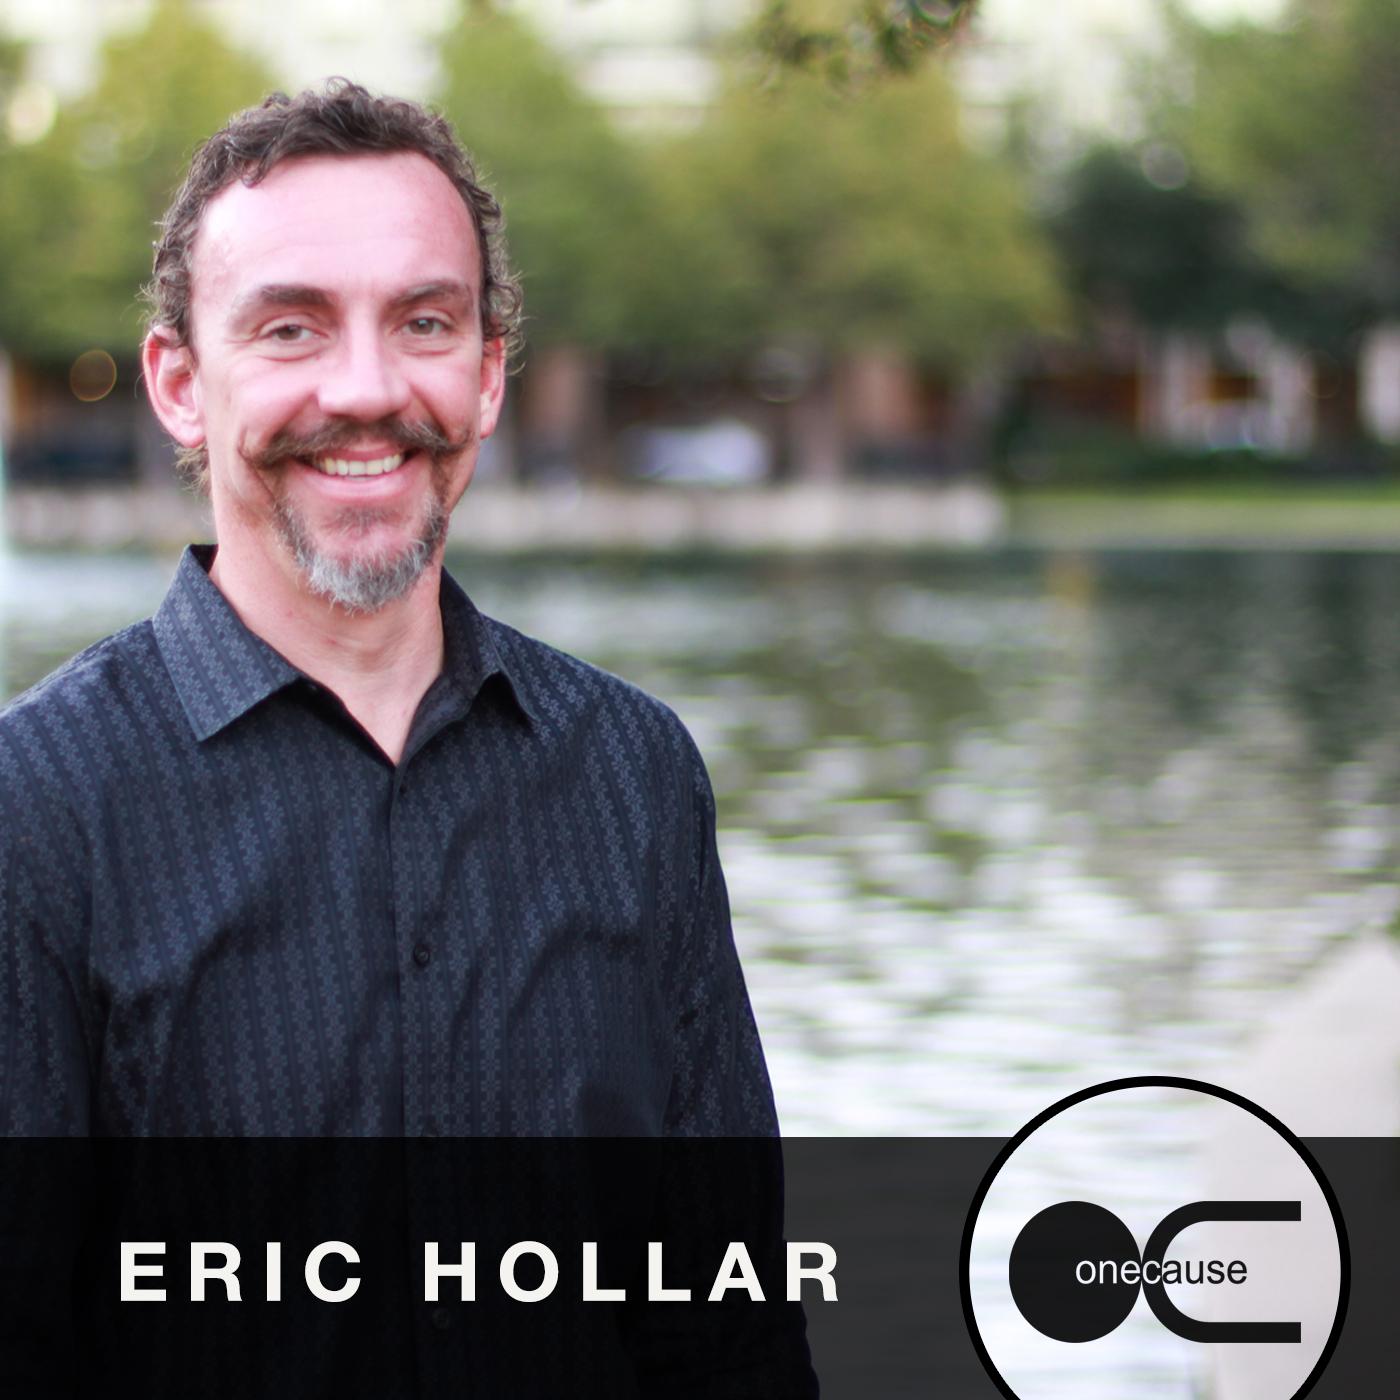 Eric Hollar